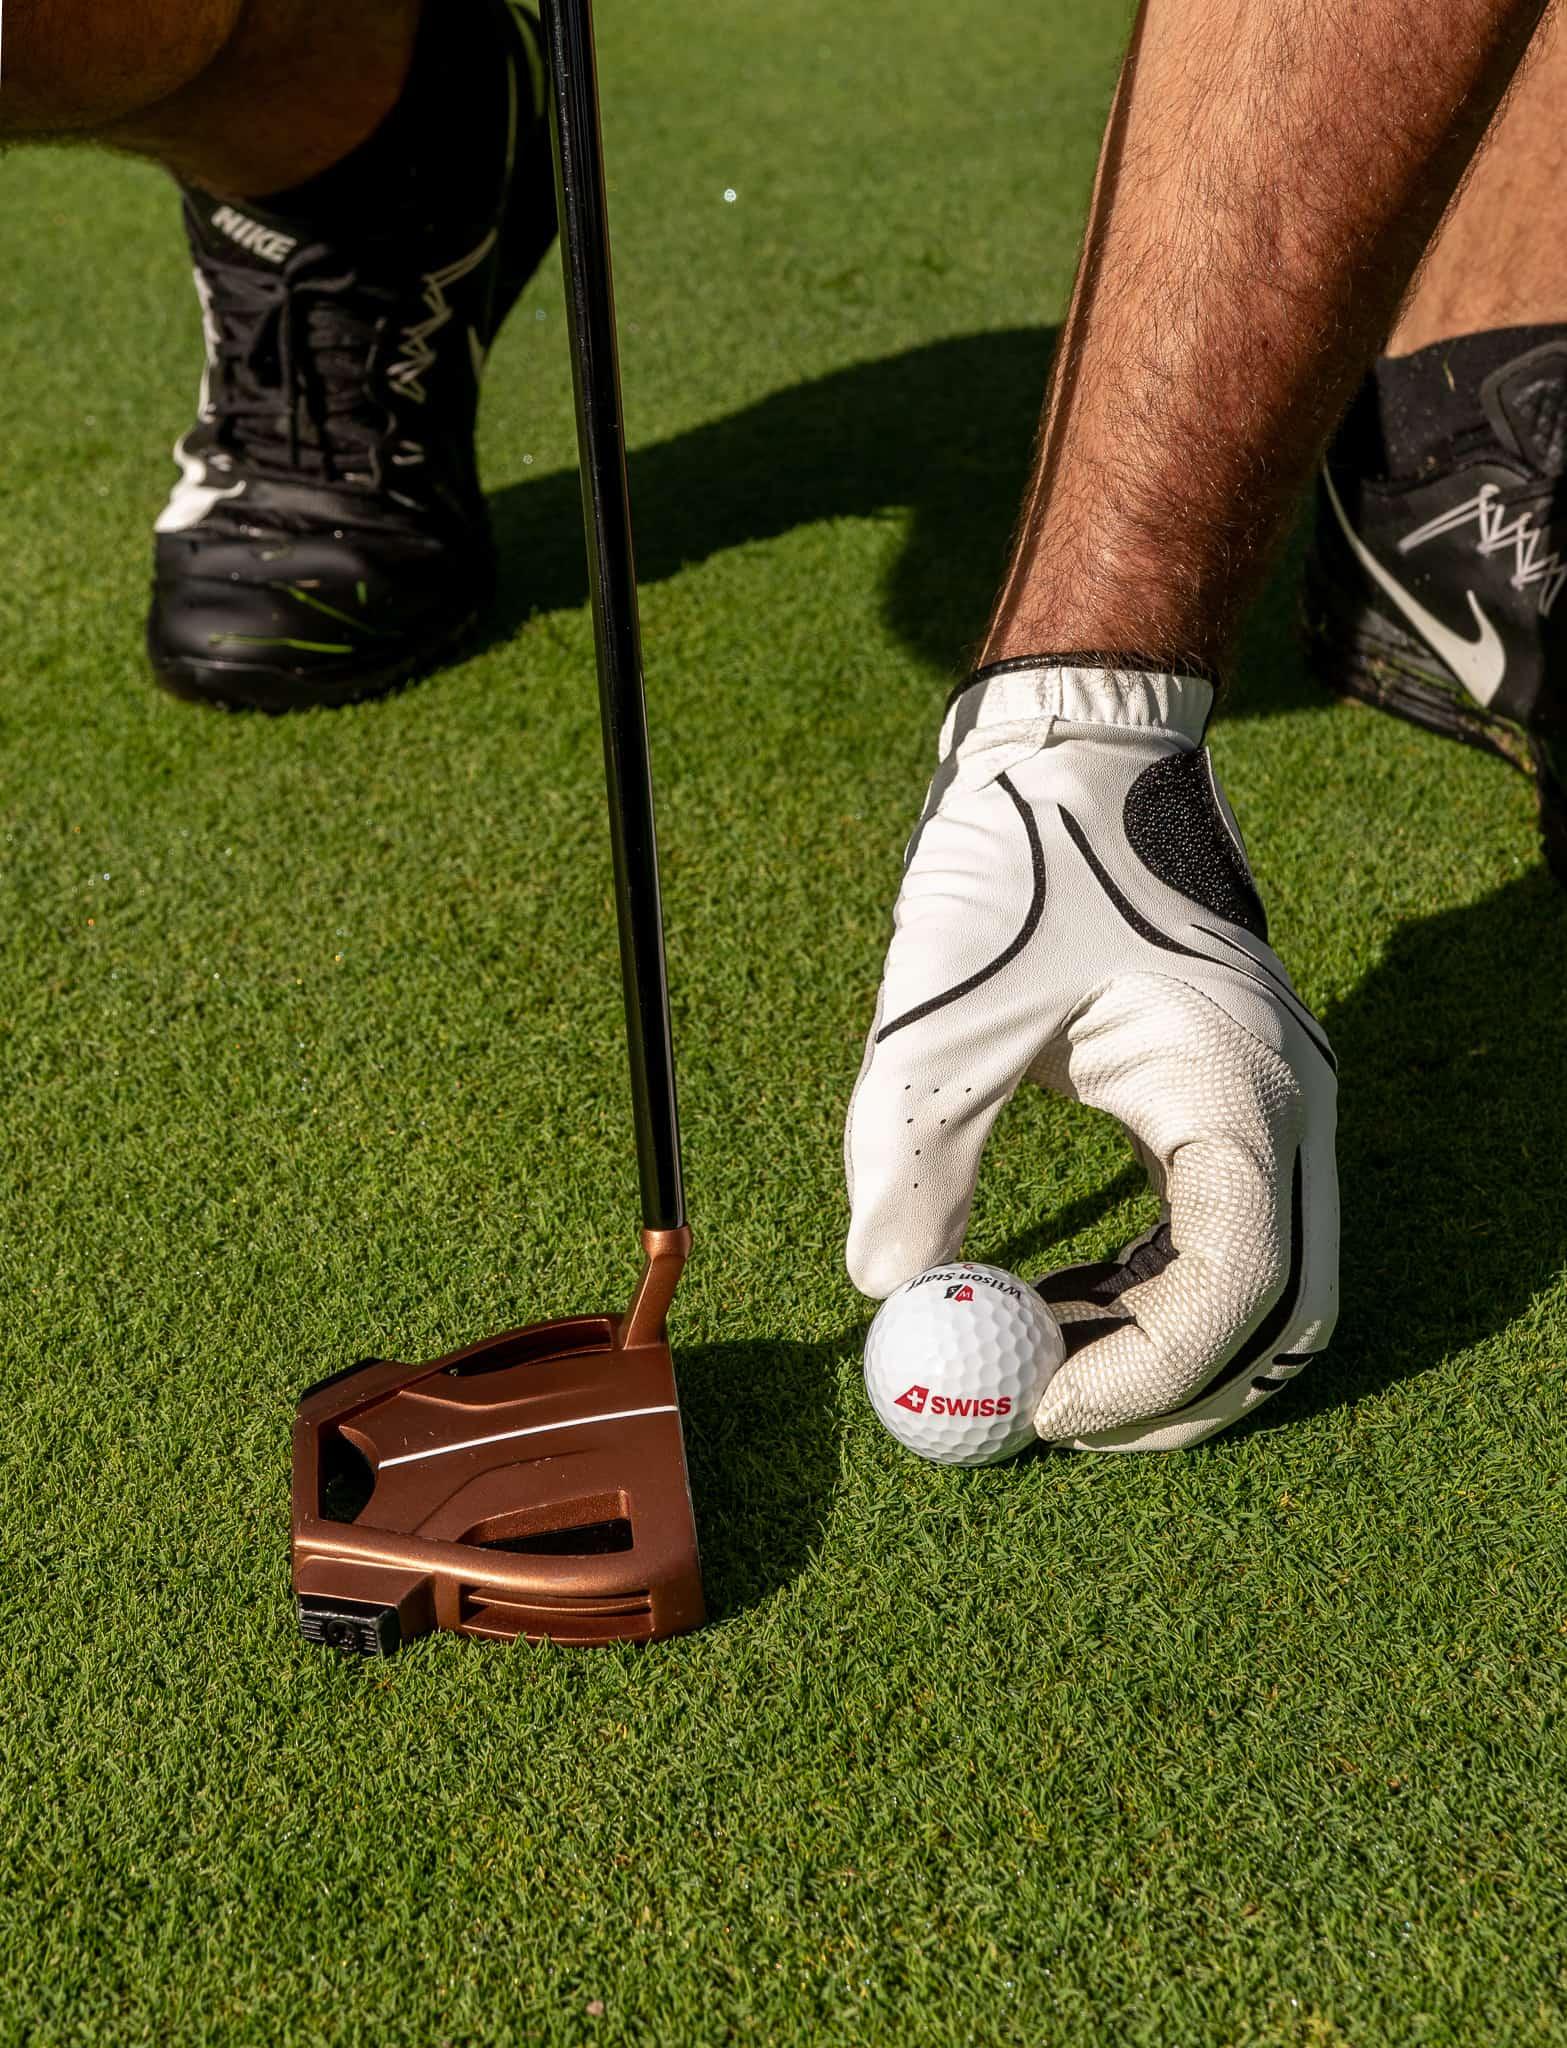 swiss golf member